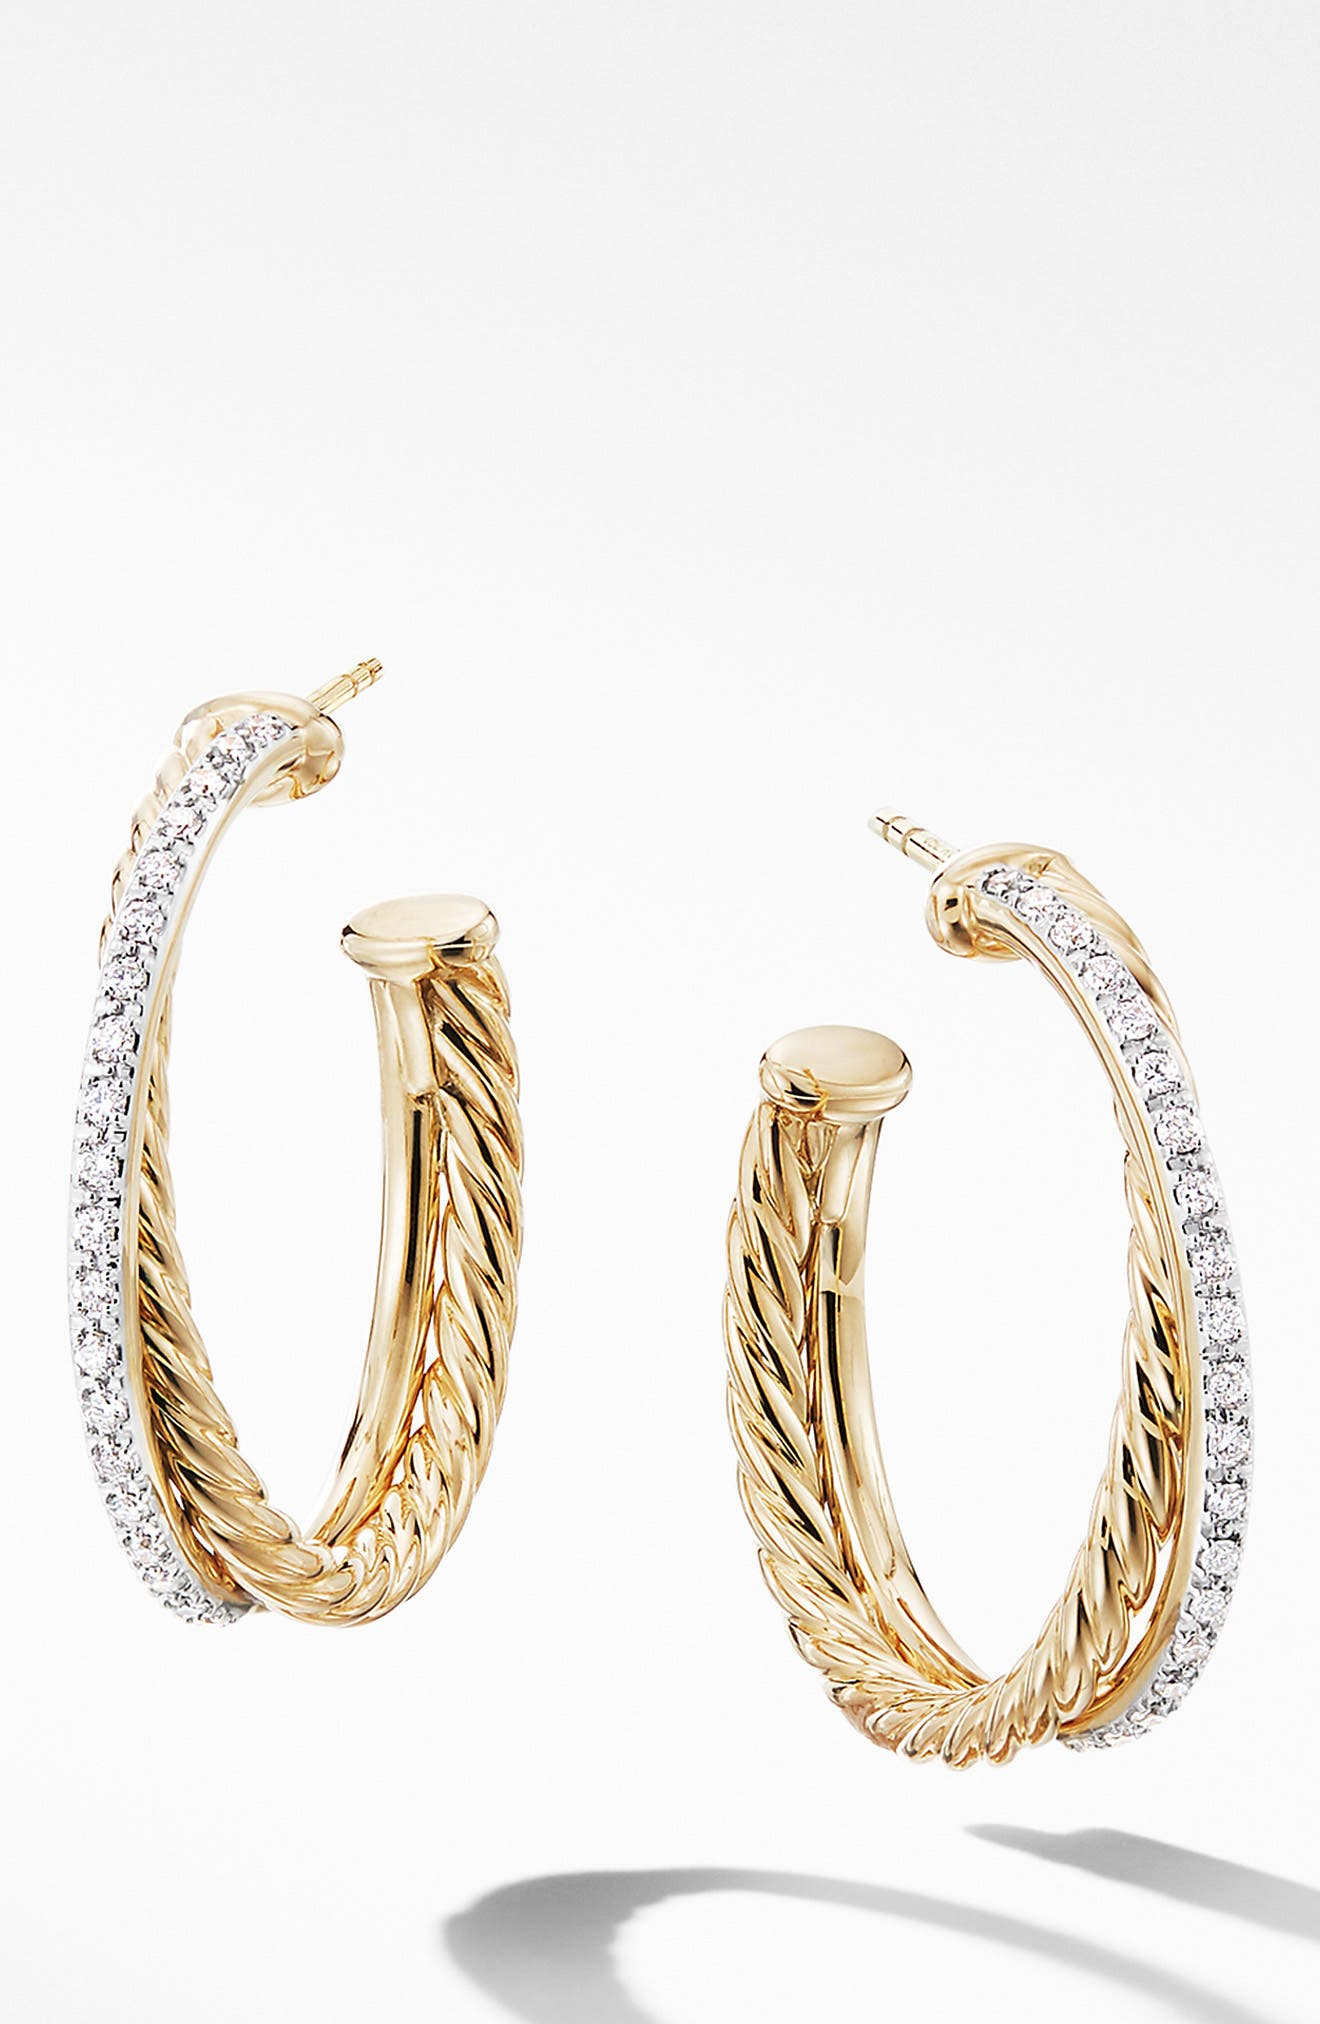 DAVID YURMAN Medium Crossover Hoop Earrings with Diamonds, Main, color, GOLD/ DIAMOND